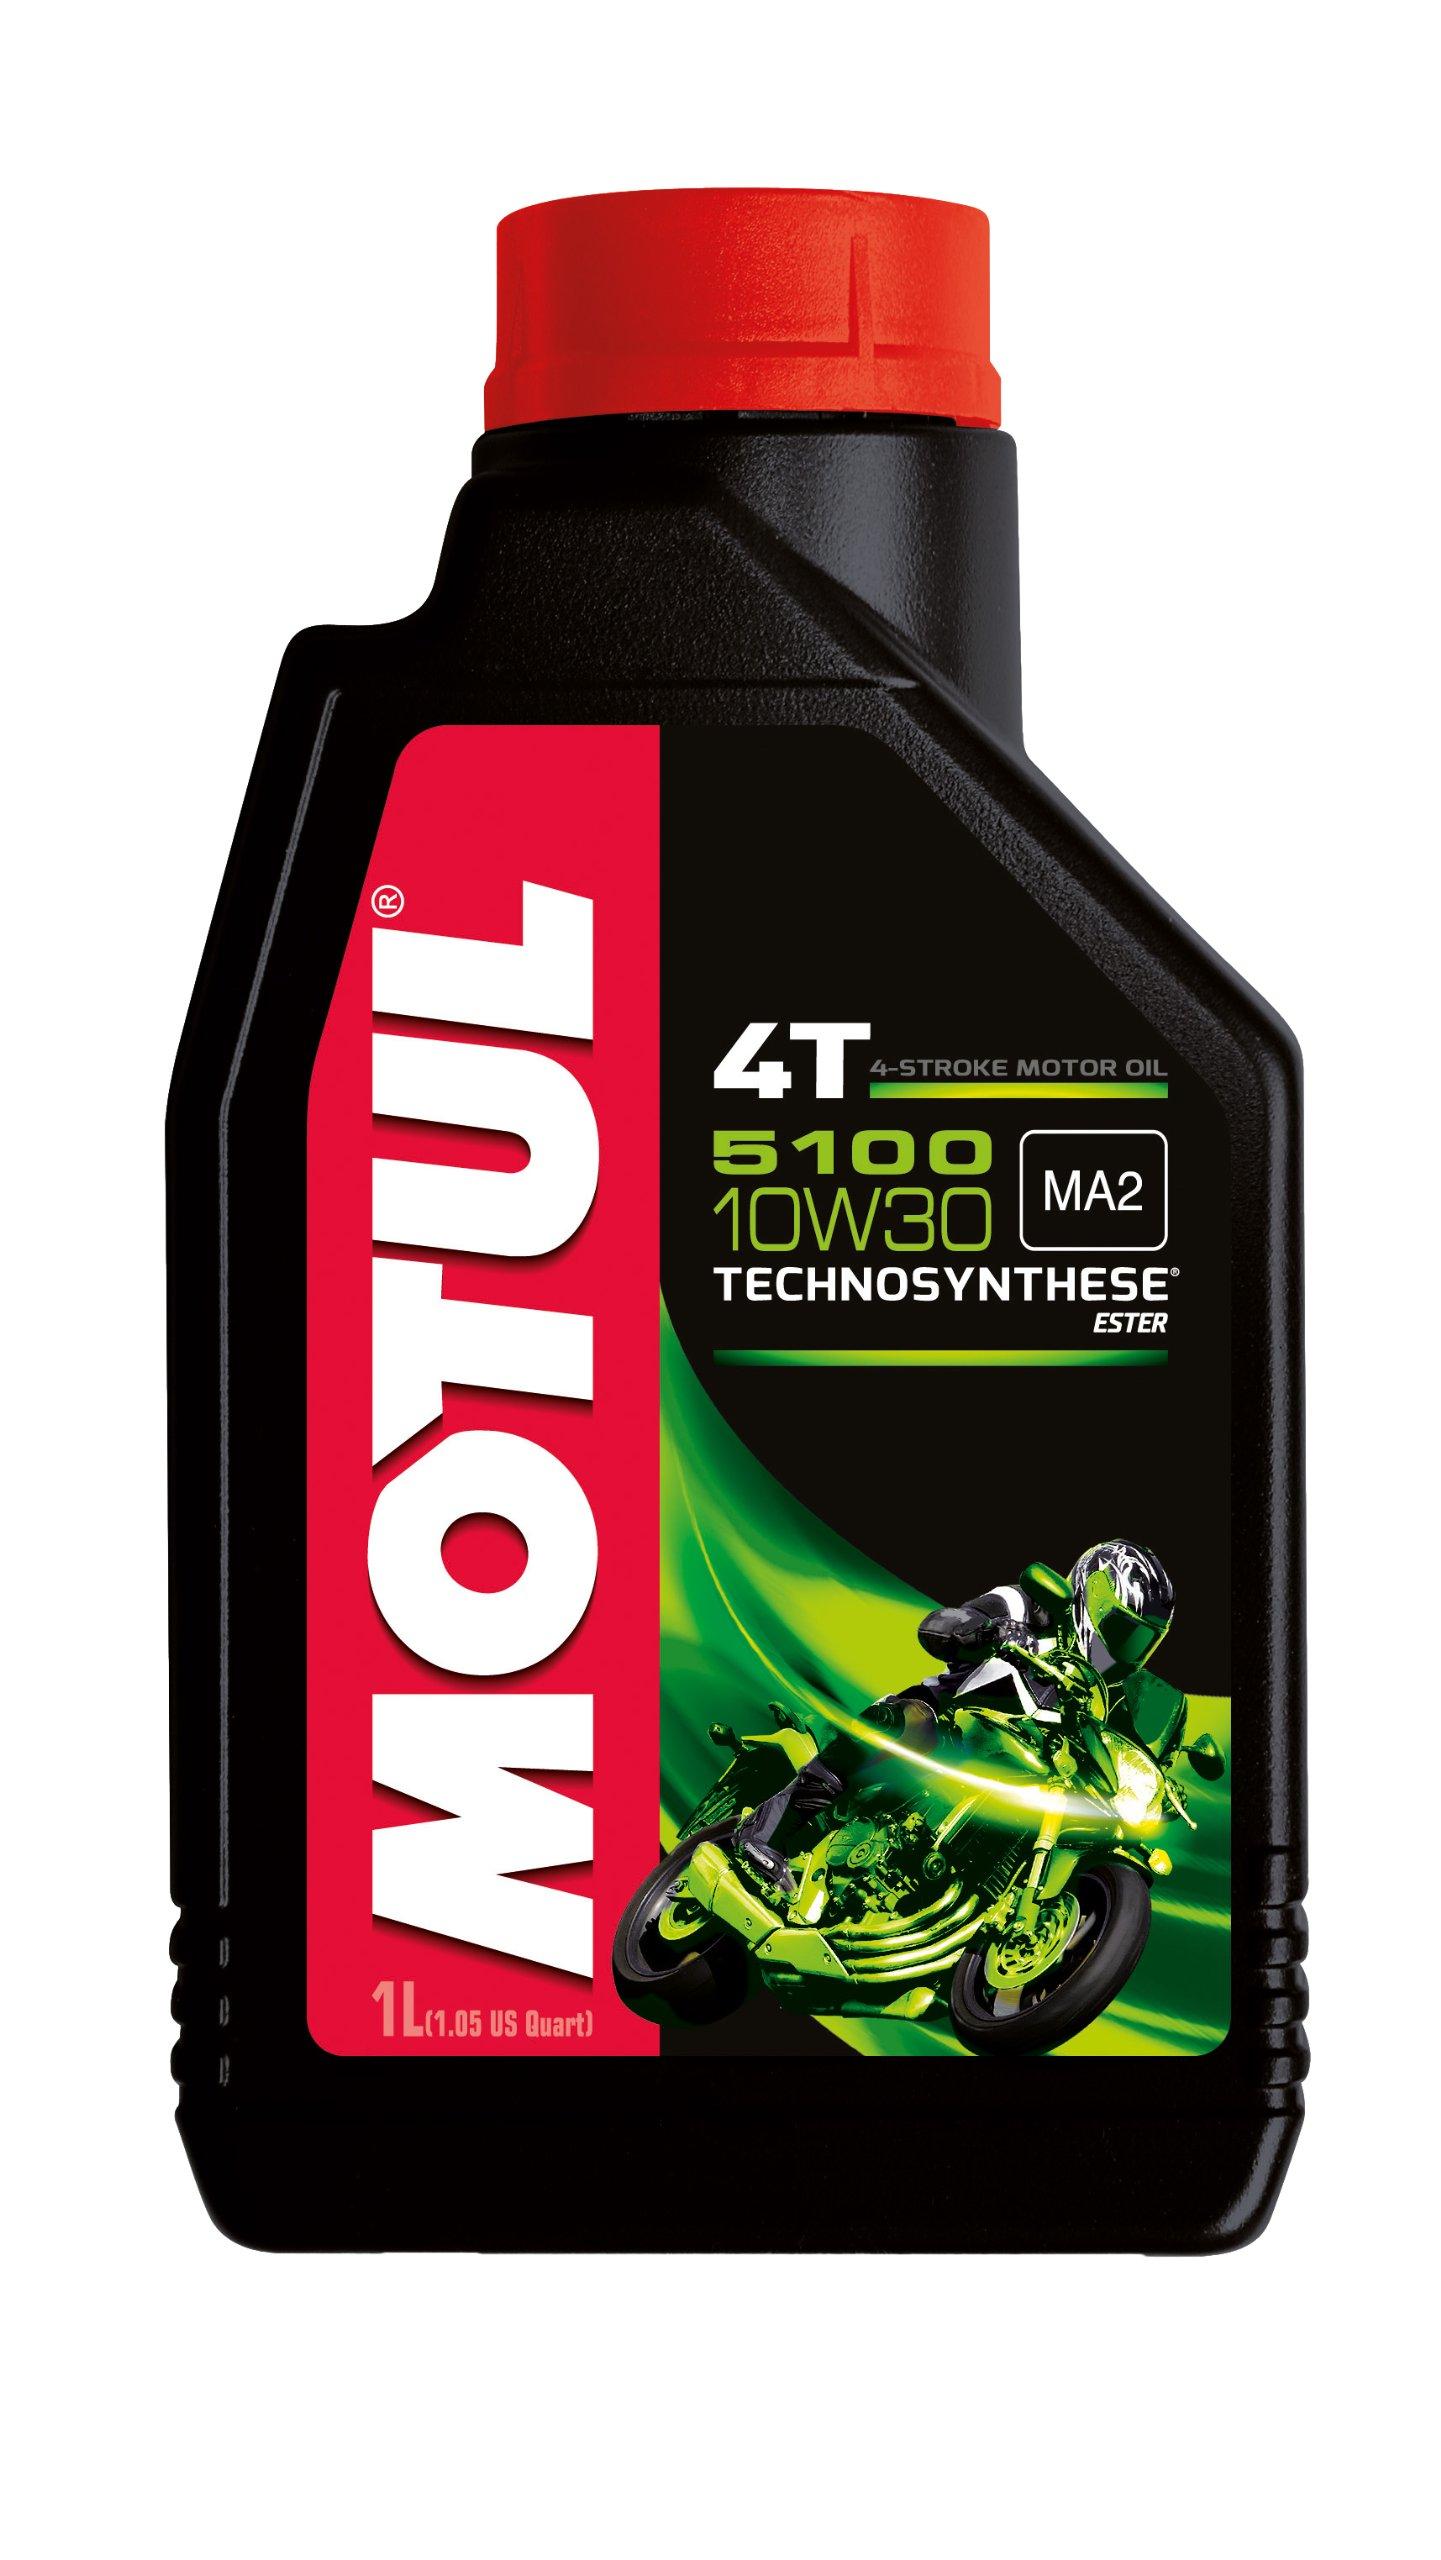 Motul 104062 5100 4T Hybrid 10W-30 API SM Technosynthese Semi Synthetic Engine Oil for Bikes (1 L) product image